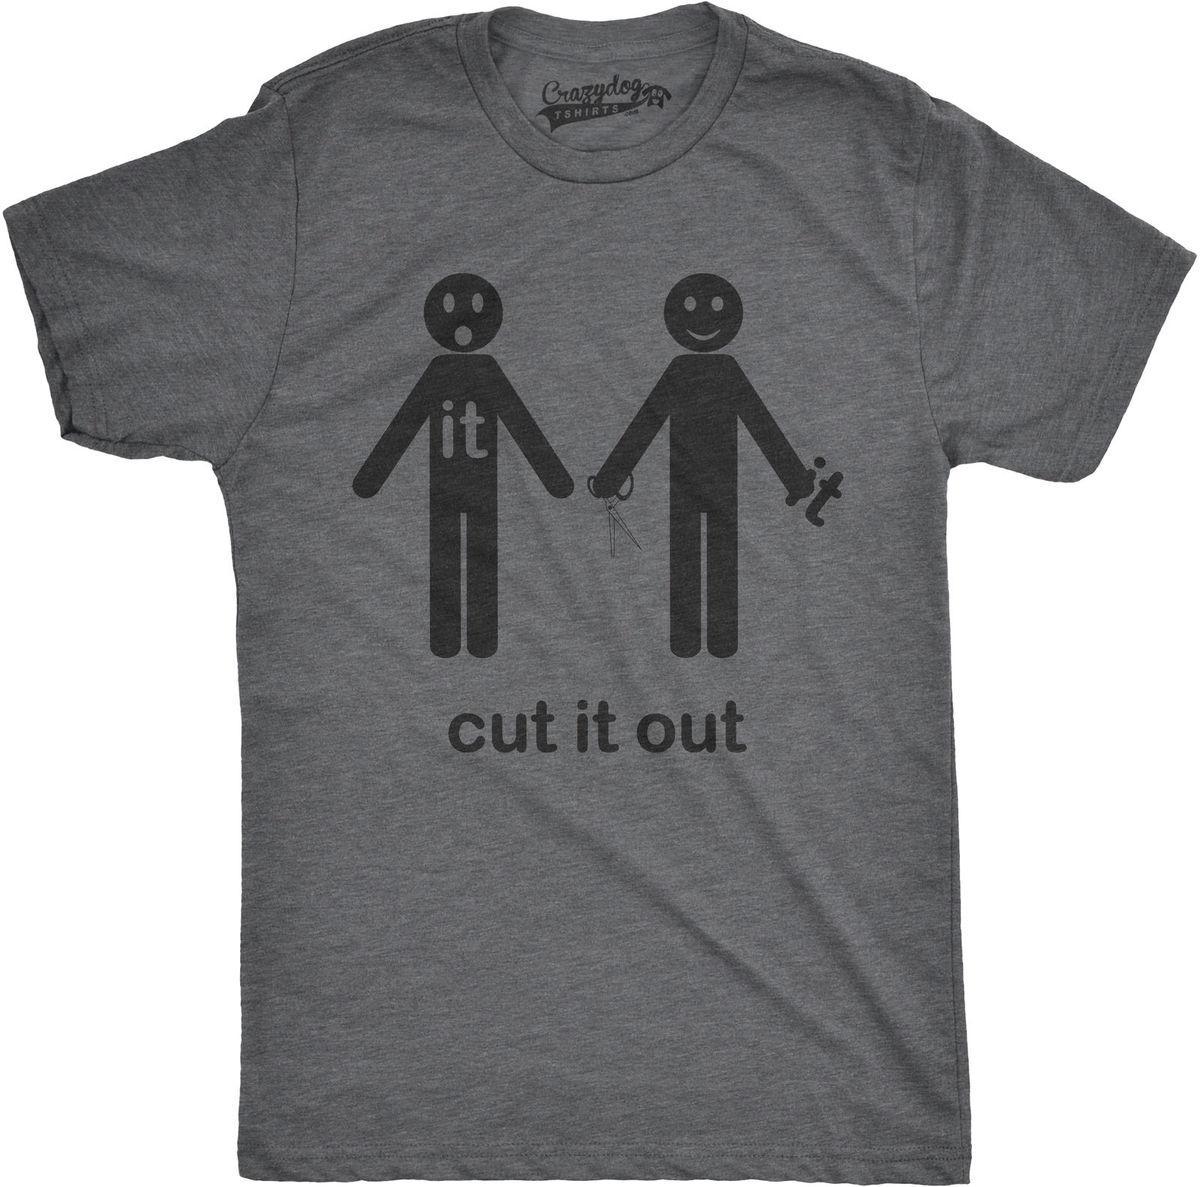 2d07ac89 Mens Cut It Out Funny Stick Figure Hilarious Phrase Scissor T shirt Tees Men'S  Clothing Big Size:S-Xxl Newest 2018 Fashion